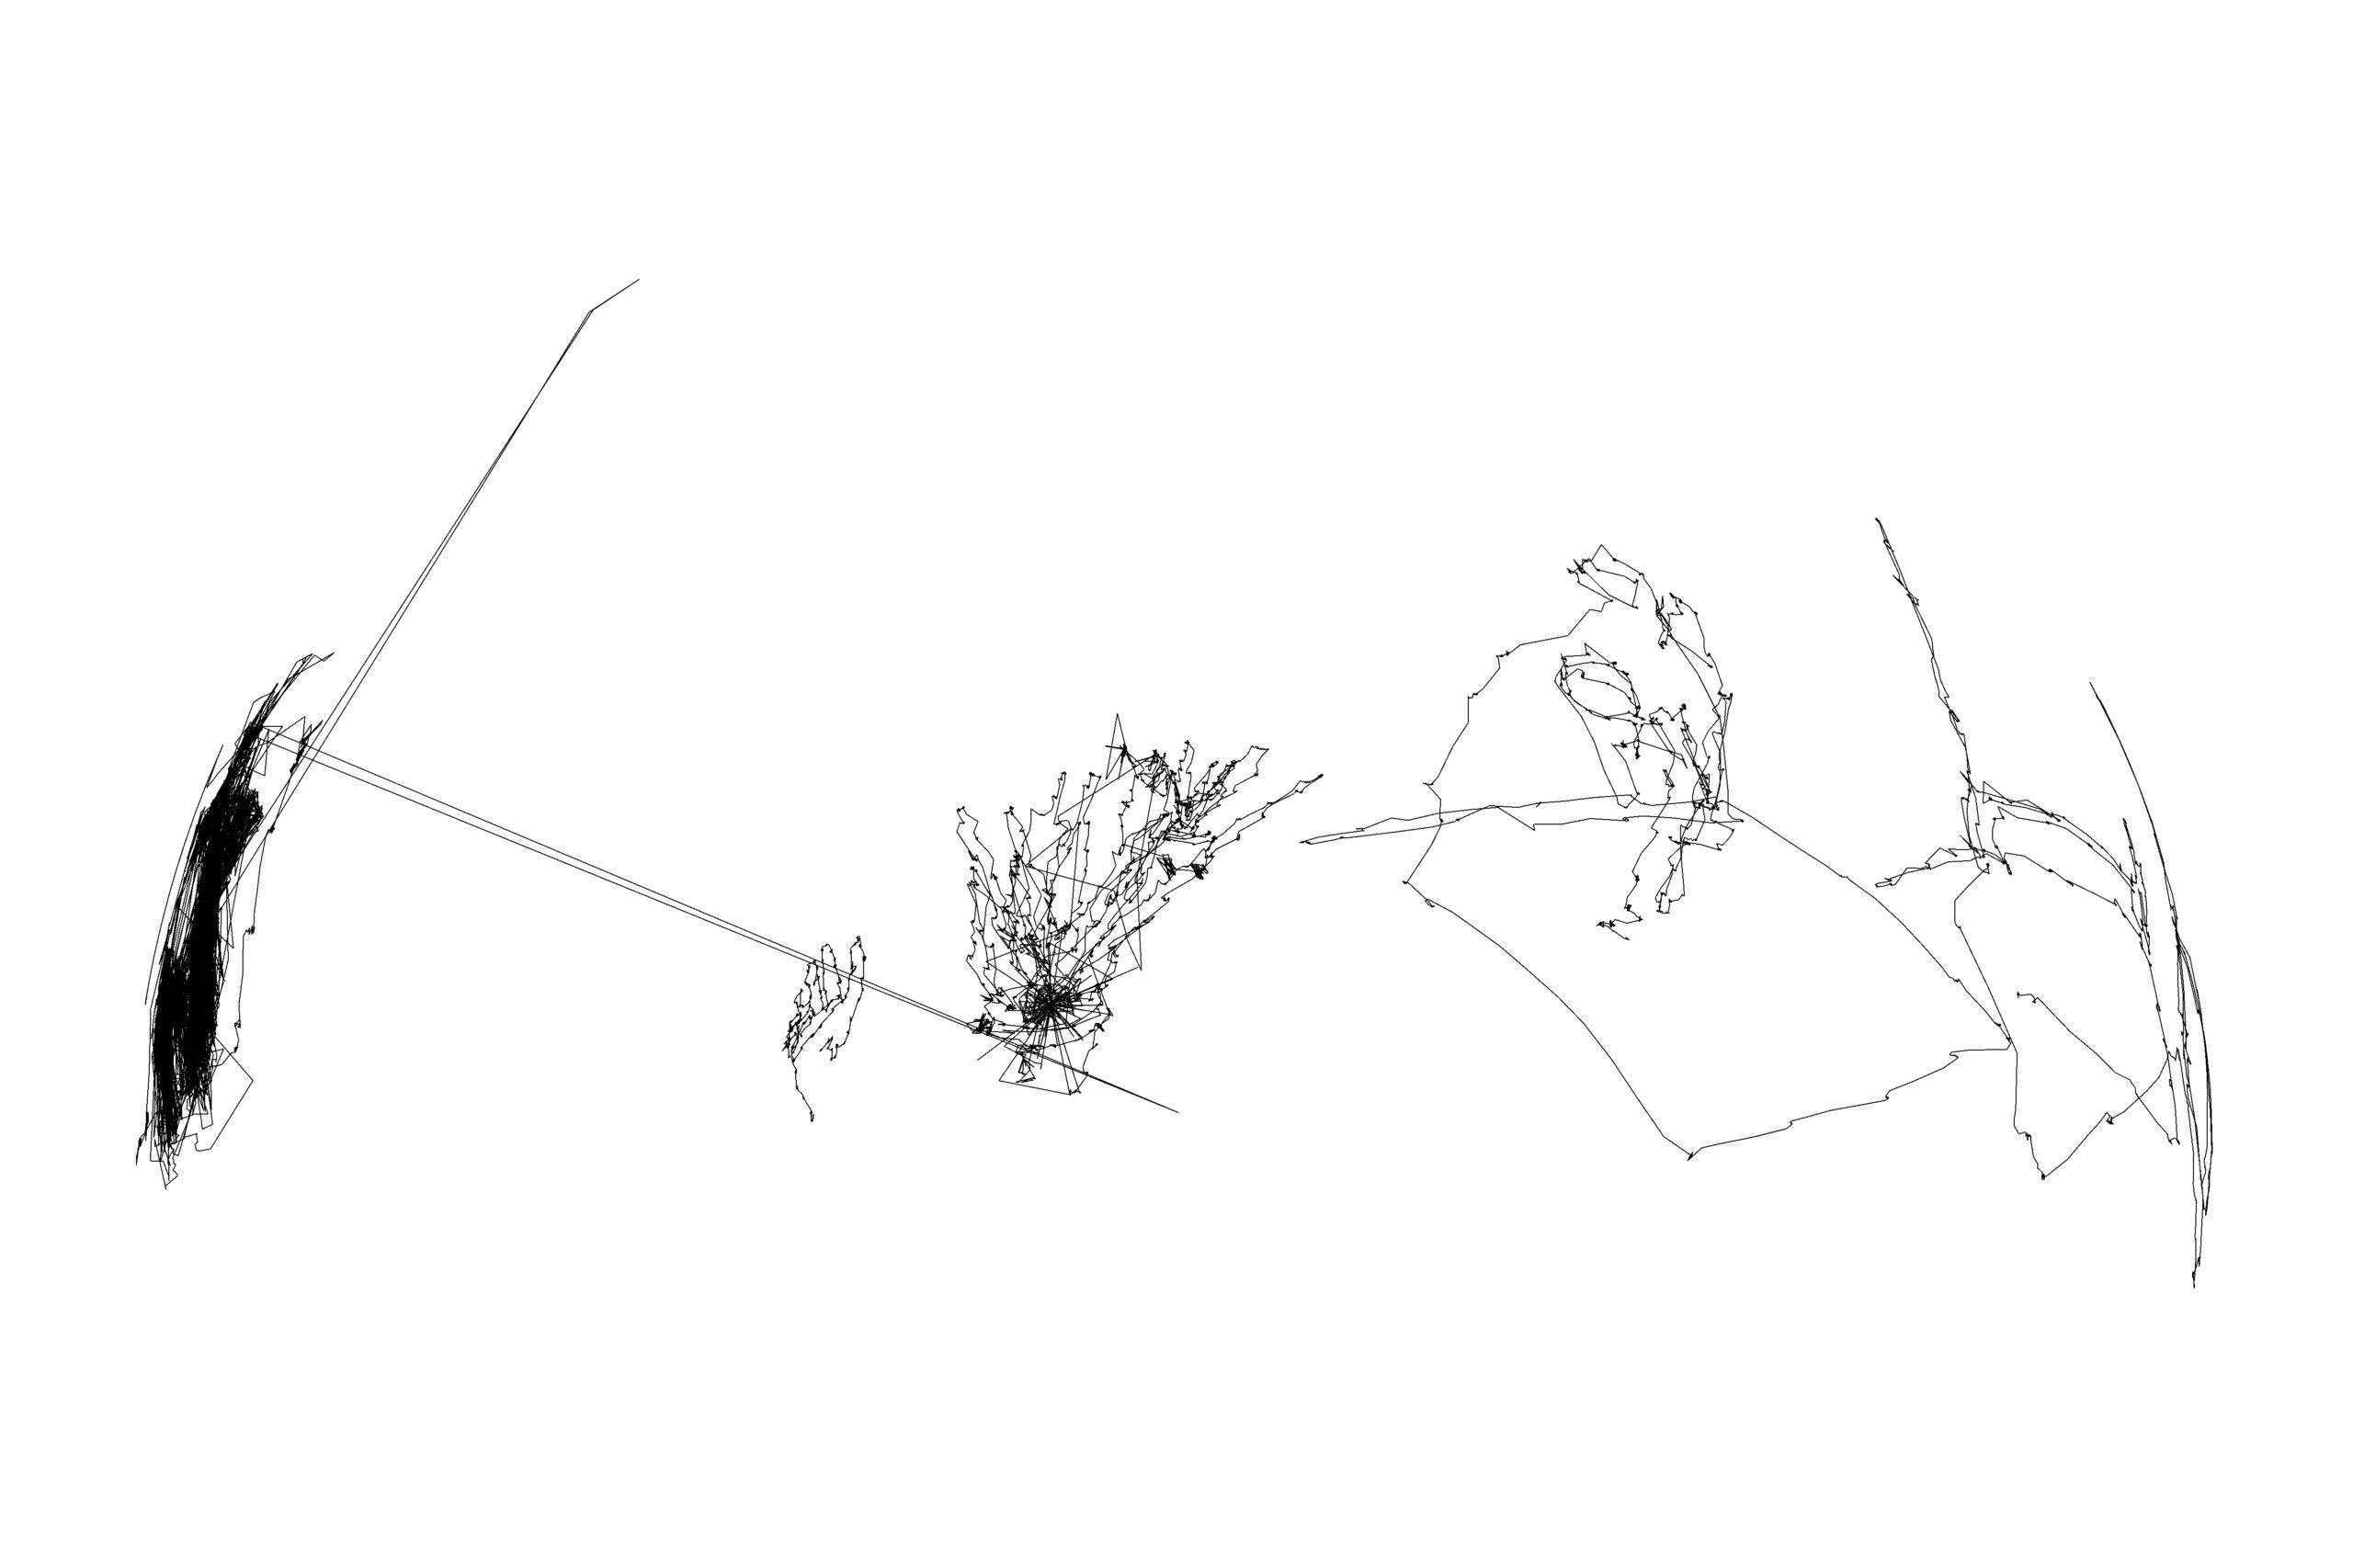 Eye drawing my bedroom. Matthew Attard, contemporary drawing, digital drawing, eye-drawing, eye-tracker